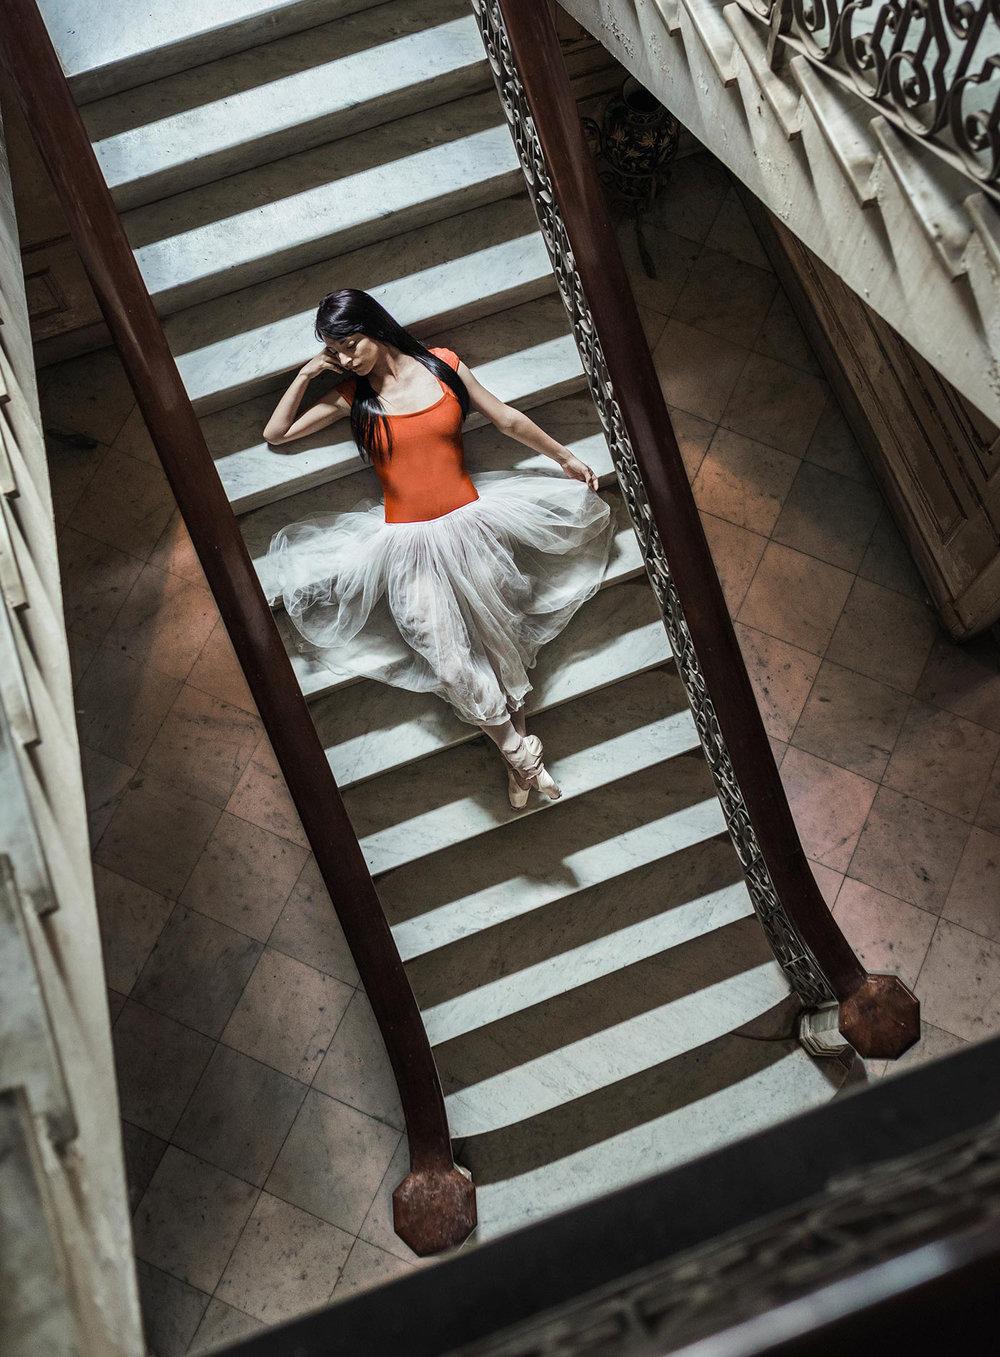 alejopik_Portraits_Fashion-Ballet_Ballerina_Stairs.jpg